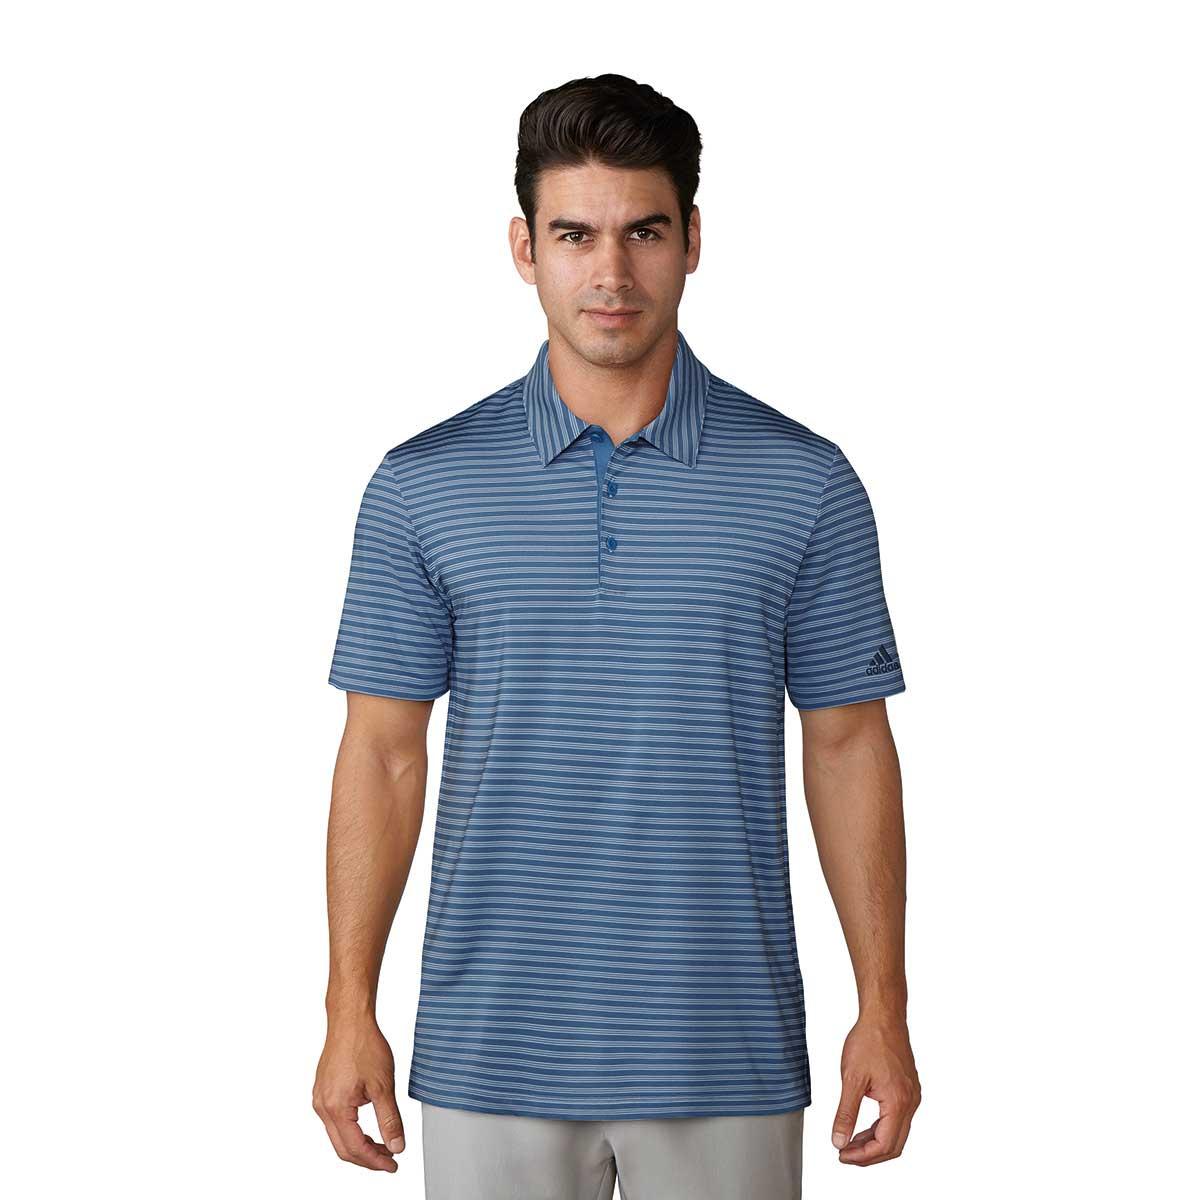 Adidas Ultimate365 2-Color Stripe Golf Polo - Blue